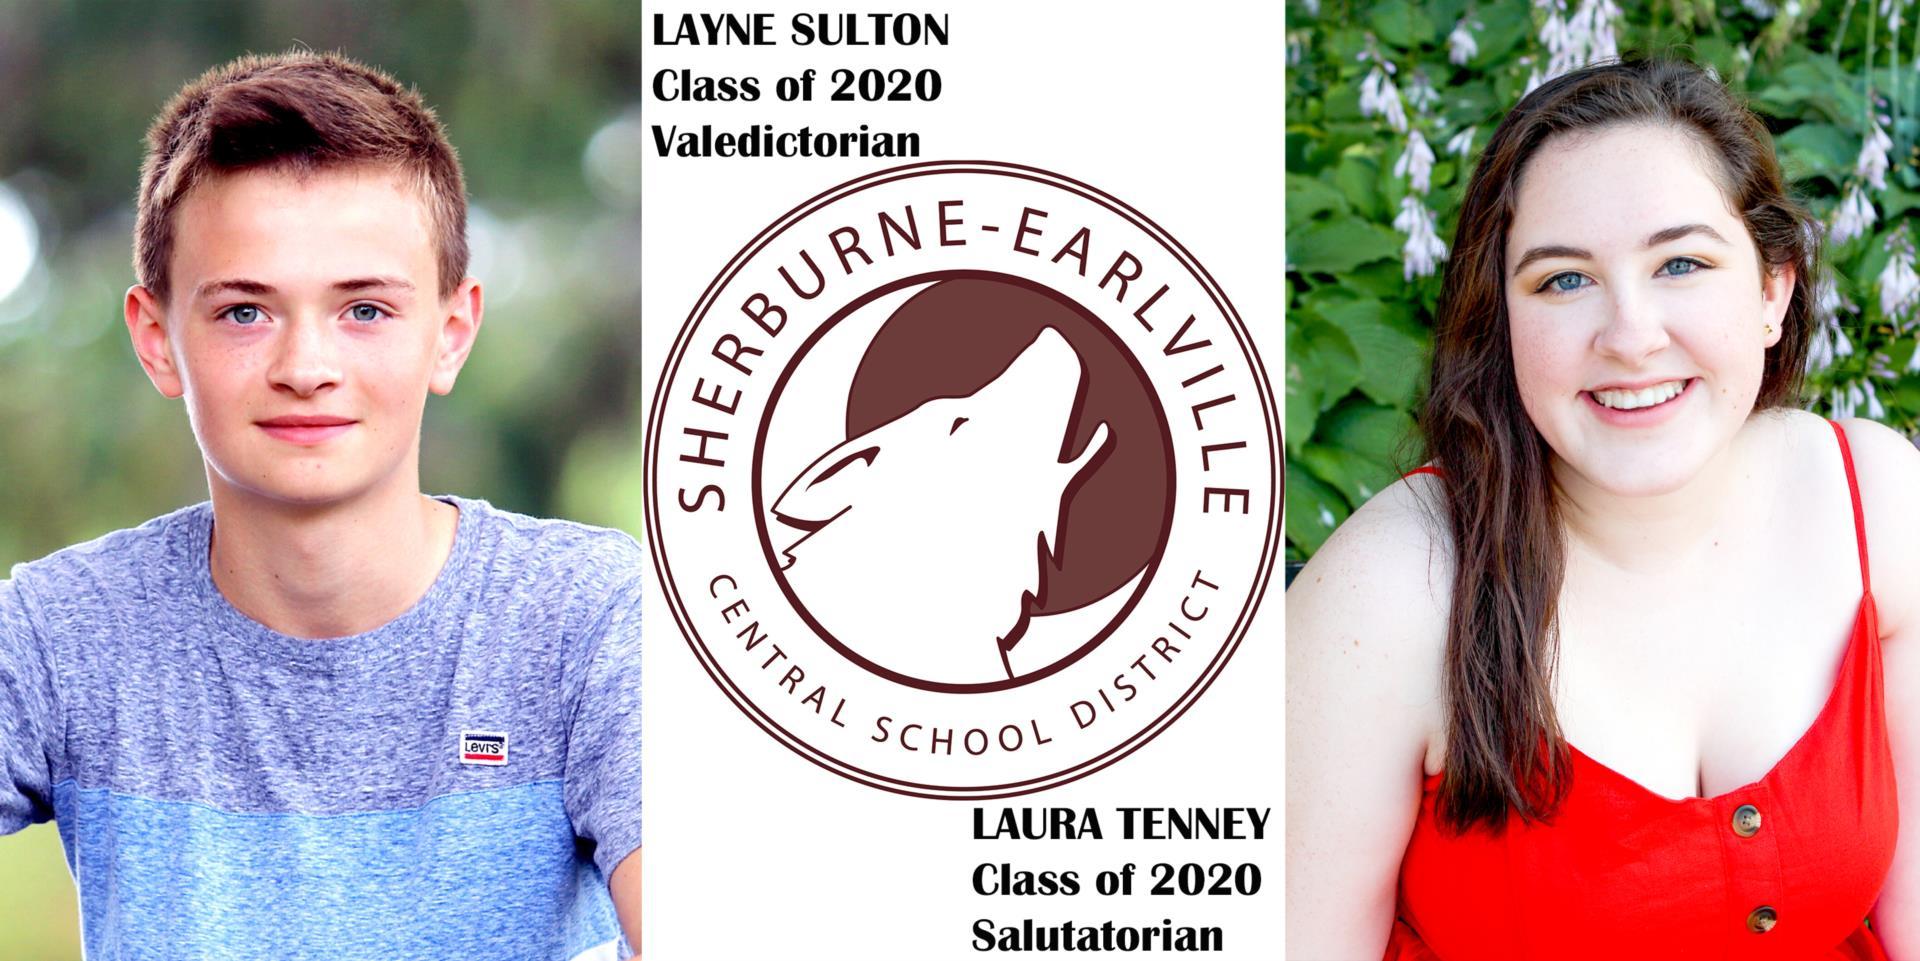 Valedictorian Layne Sulton and Salutatorian Laura Tenney 2020